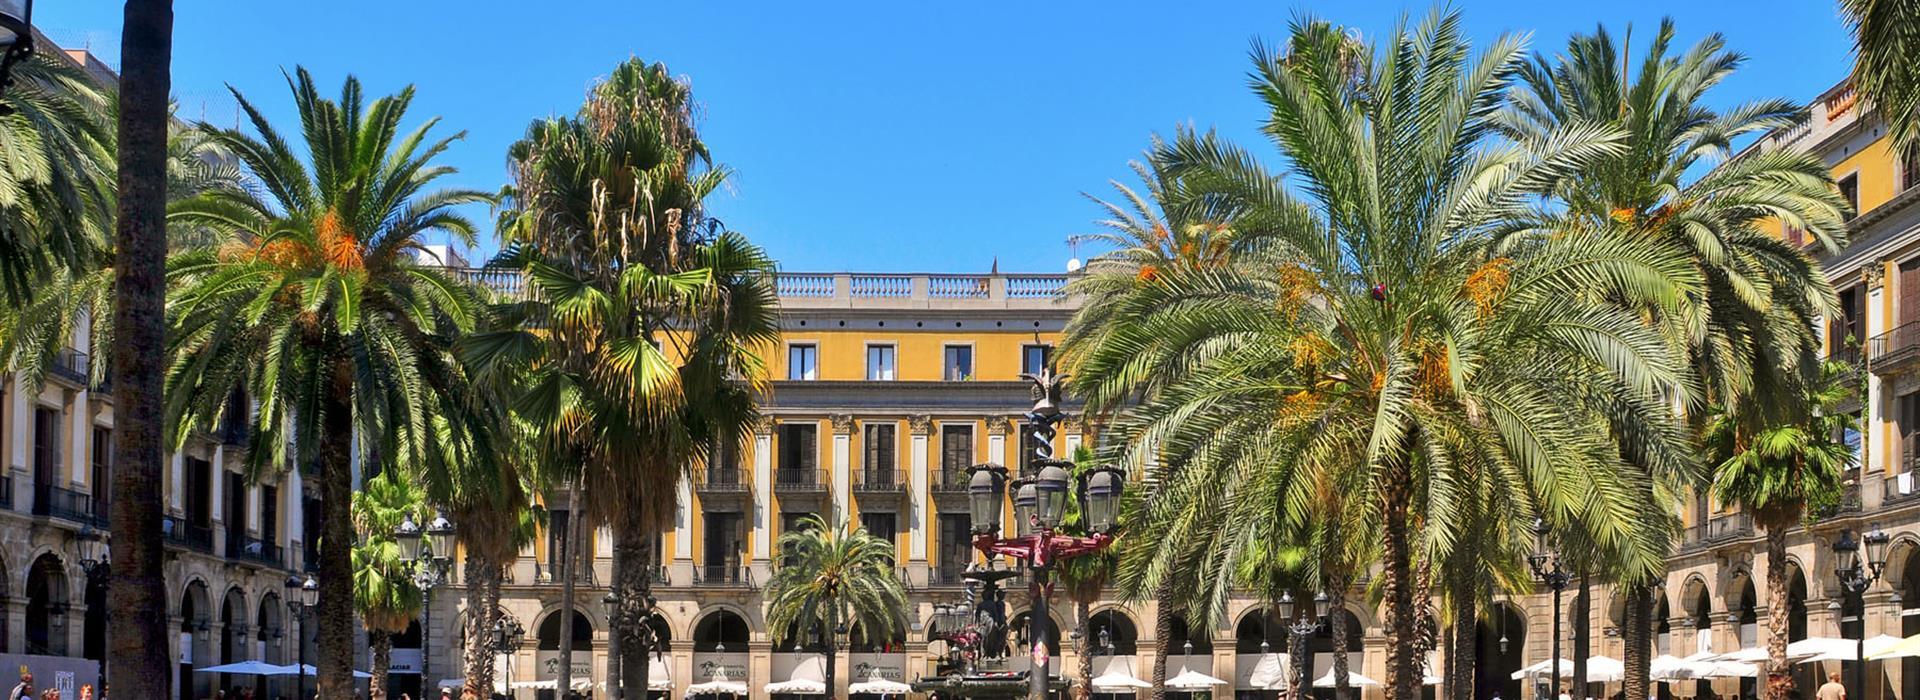 Spain-Barcelona_88459183